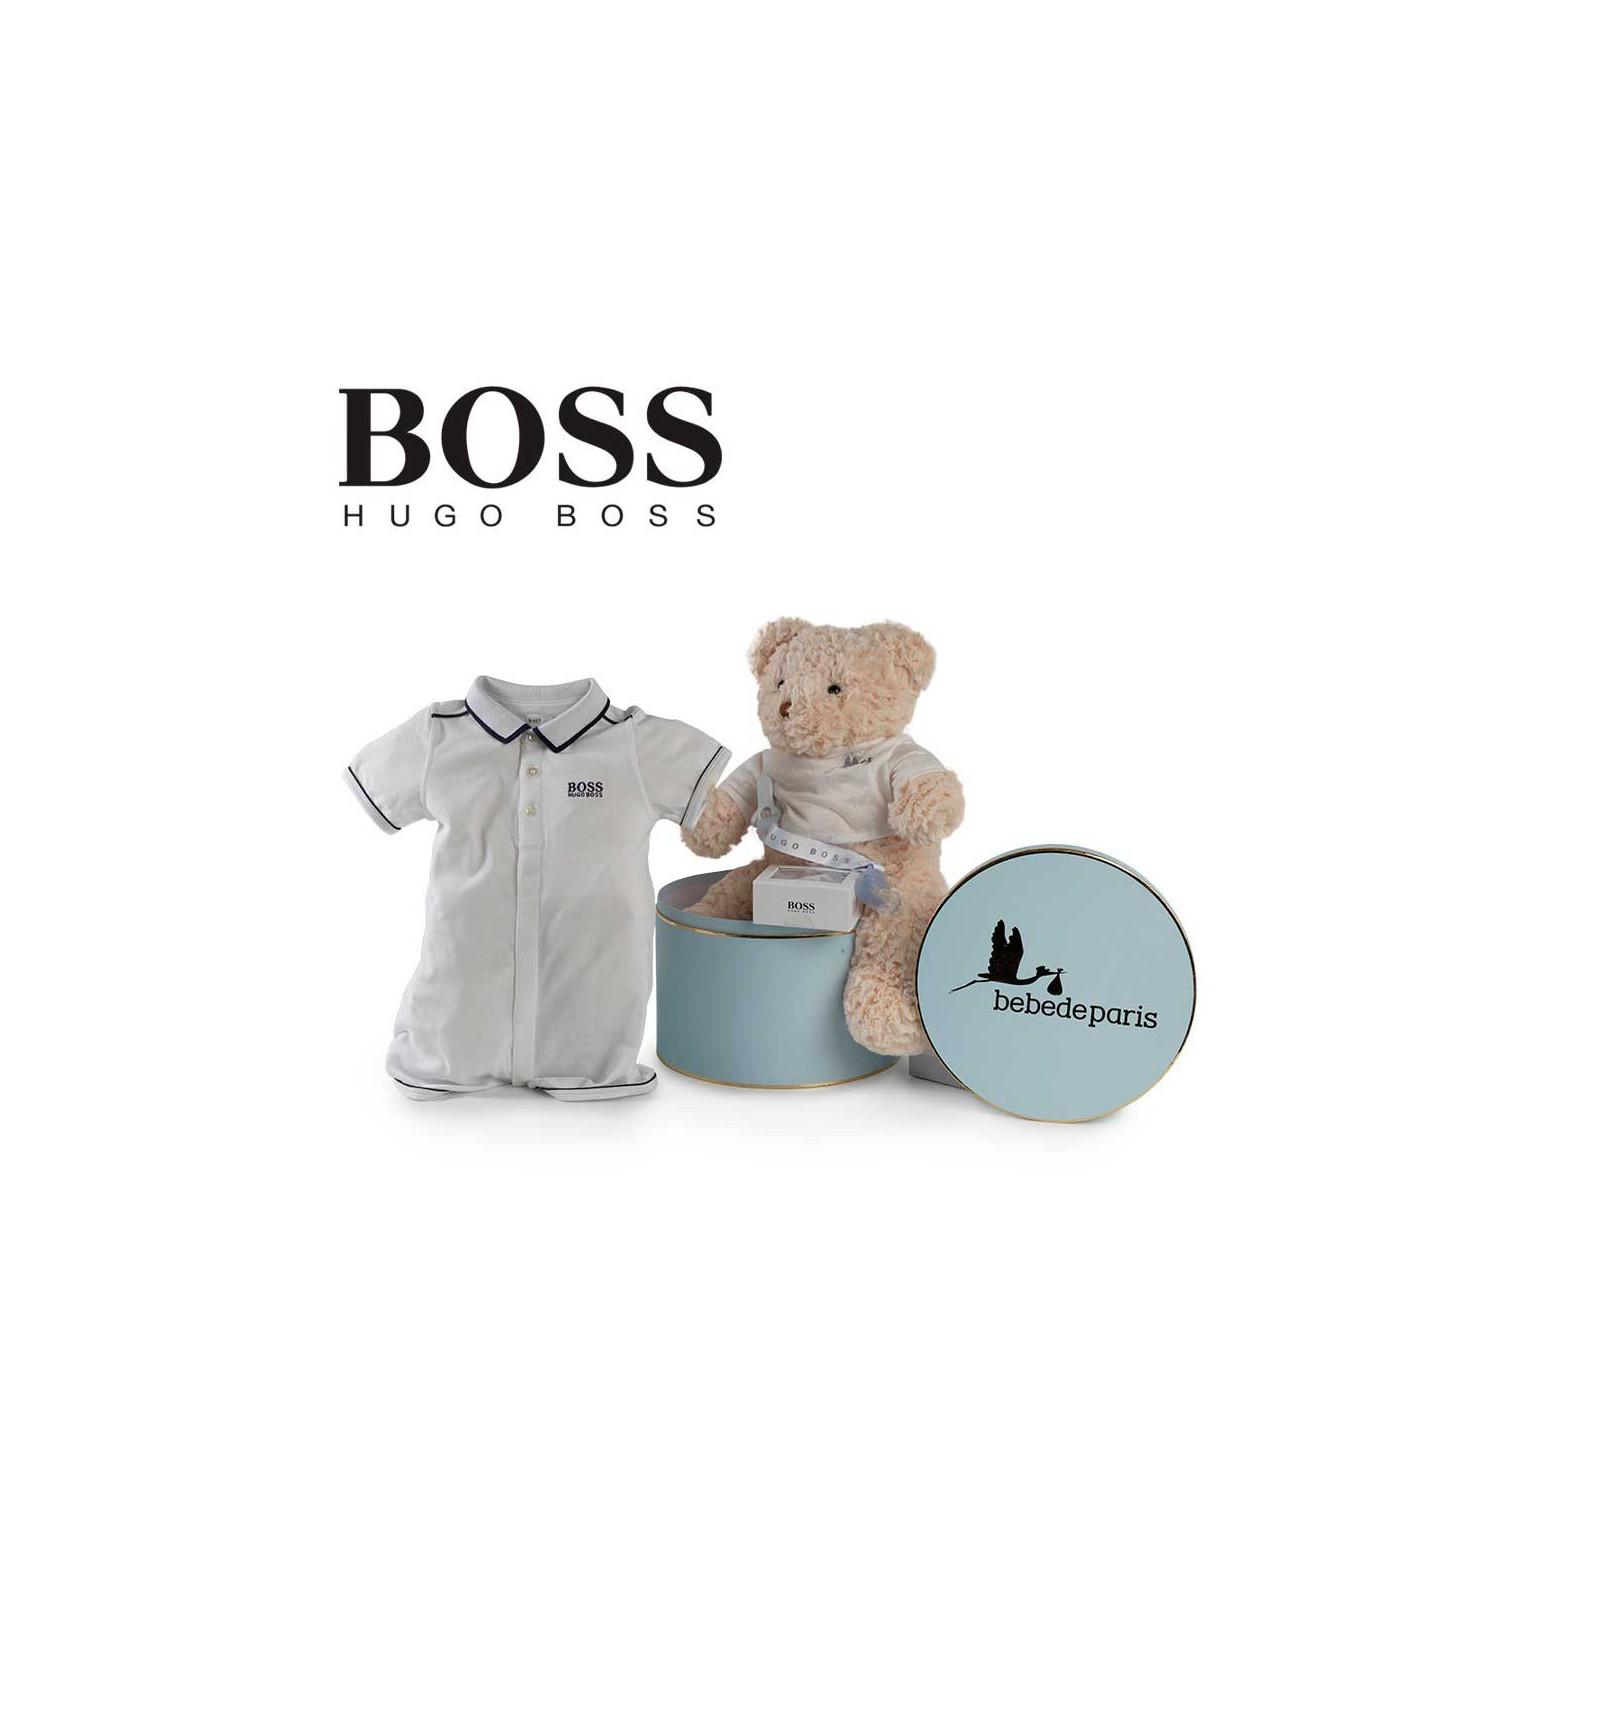 canastilla beb hugo boss casual ni o beb de par s. Black Bedroom Furniture Sets. Home Design Ideas